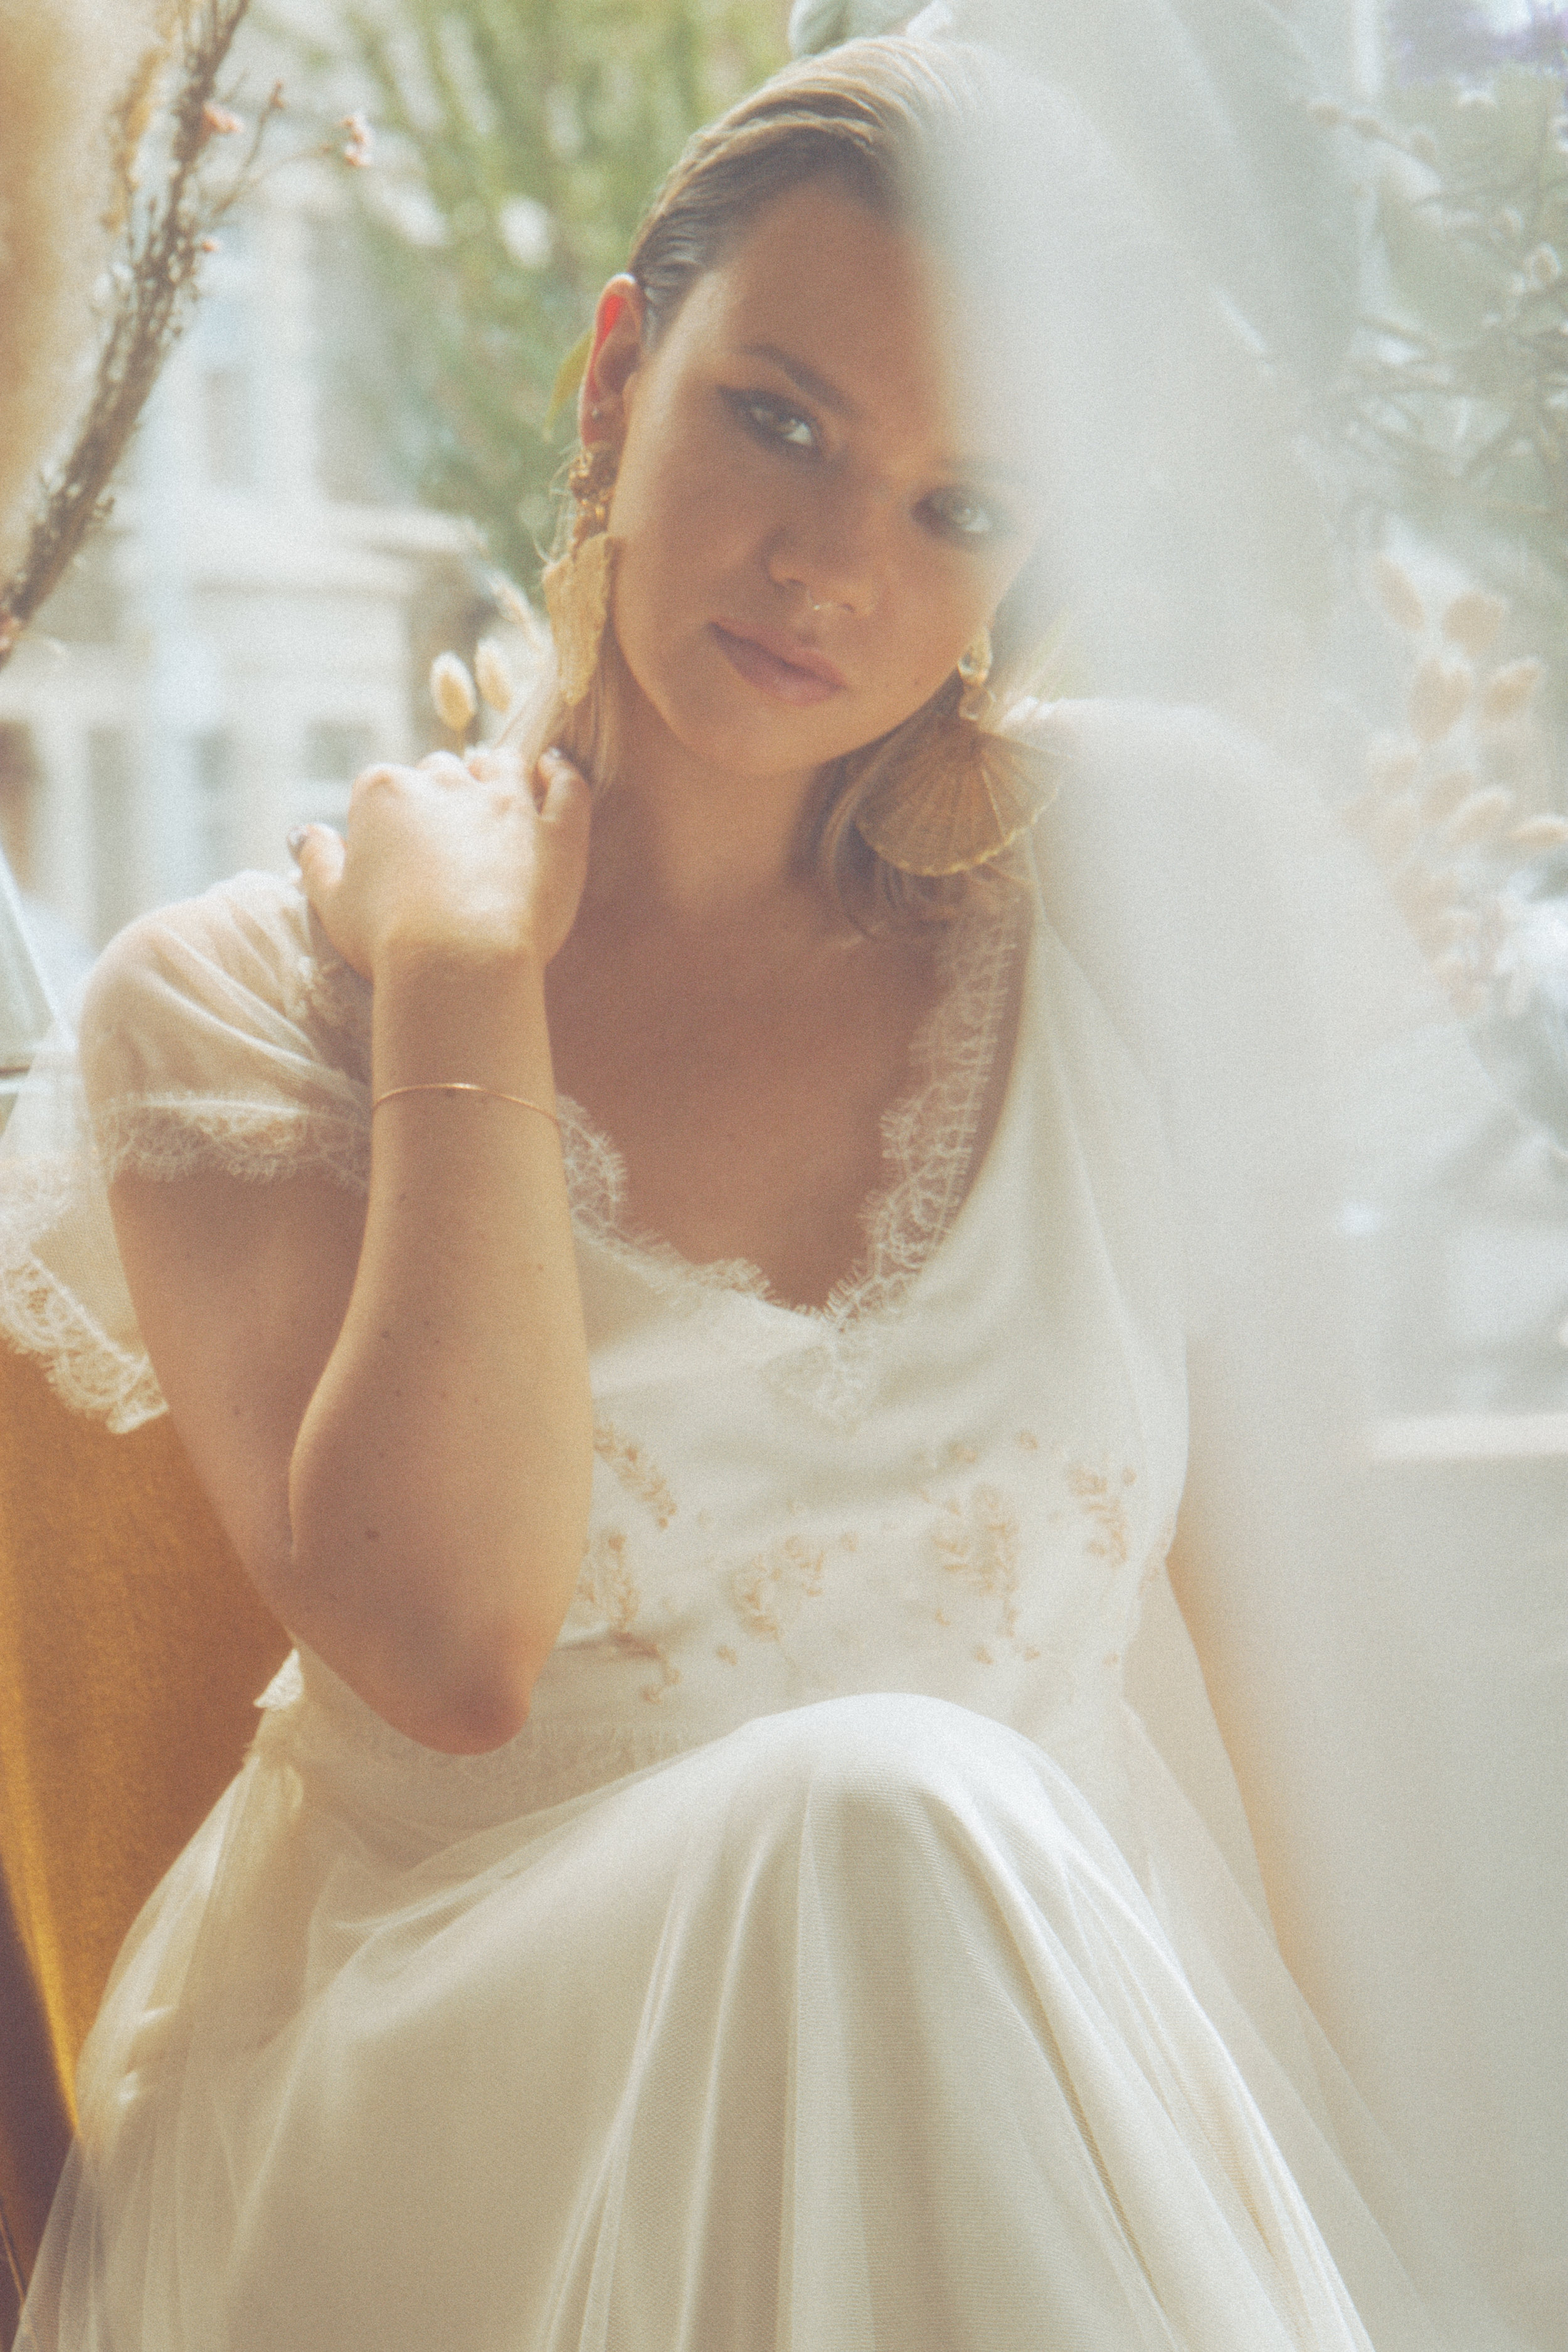 Rachel Burgess Bridal Boutique - Lovebird. Photo by Mefus Photography.#3.jpg